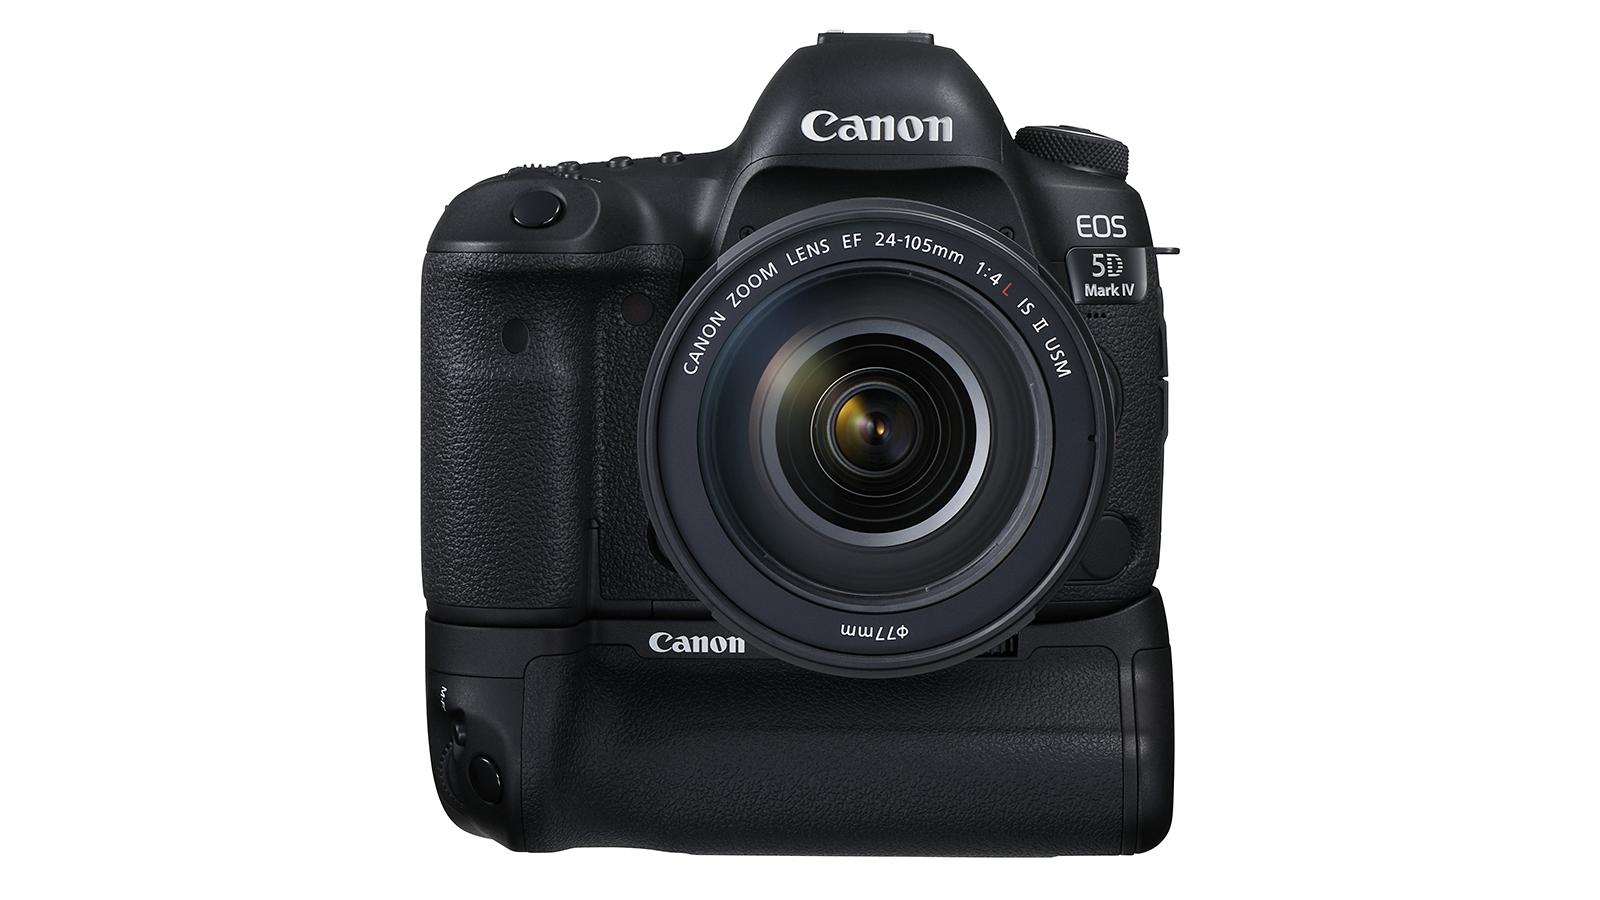 canon-eos-5d-mark-IV-008-tallaga